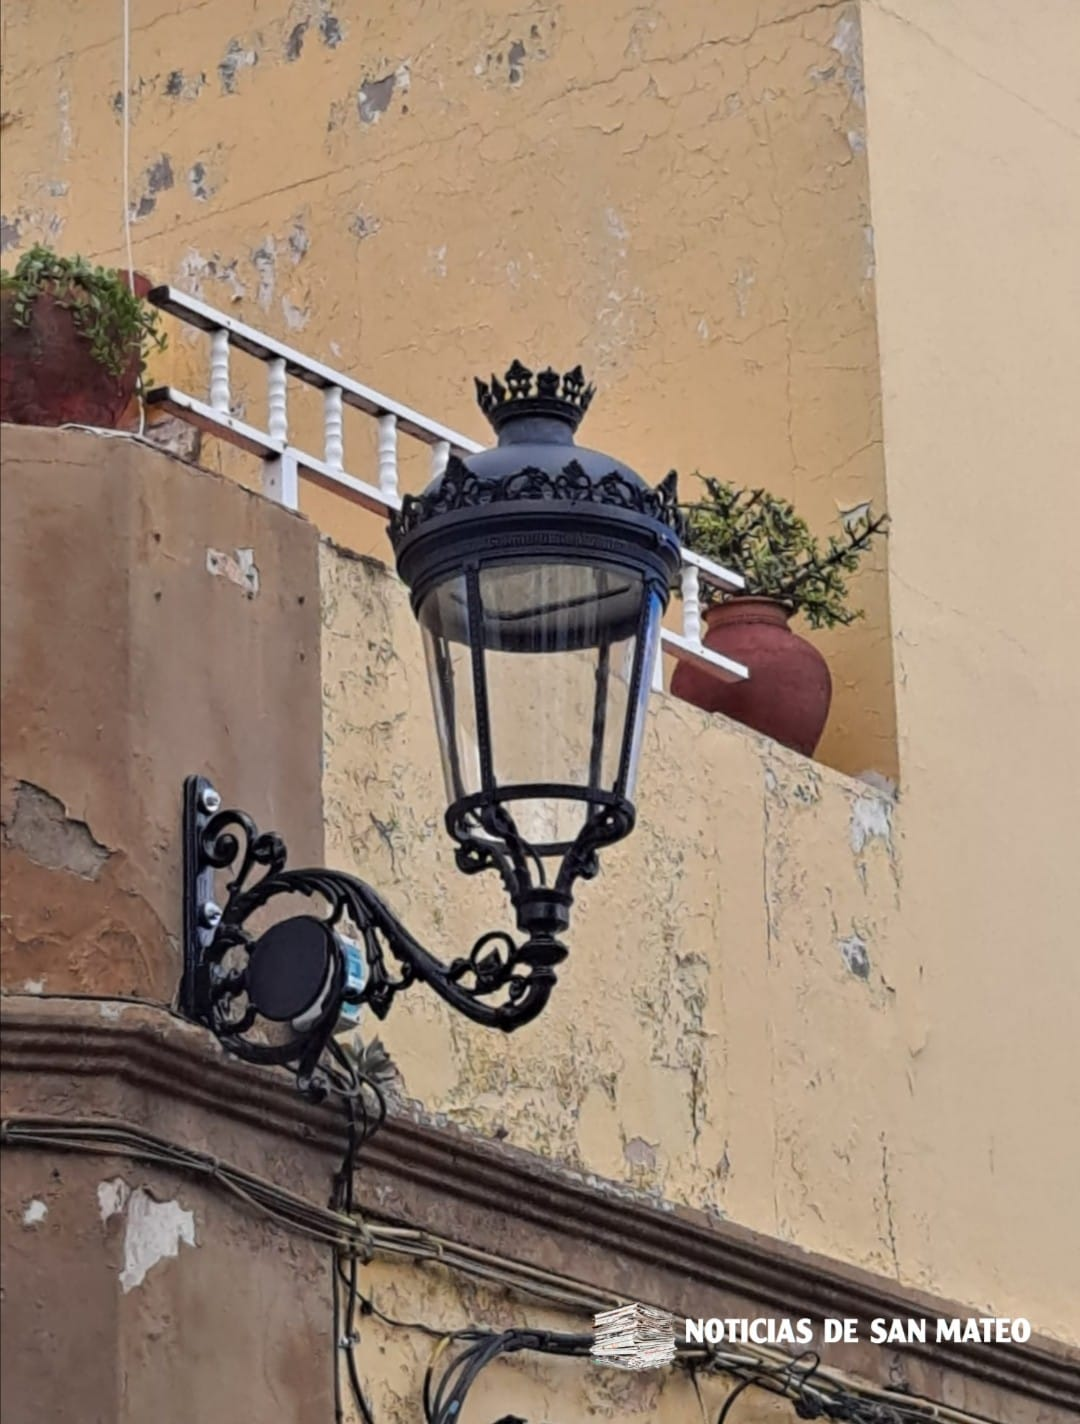 Farolas led cambio de luminarias San Mateo